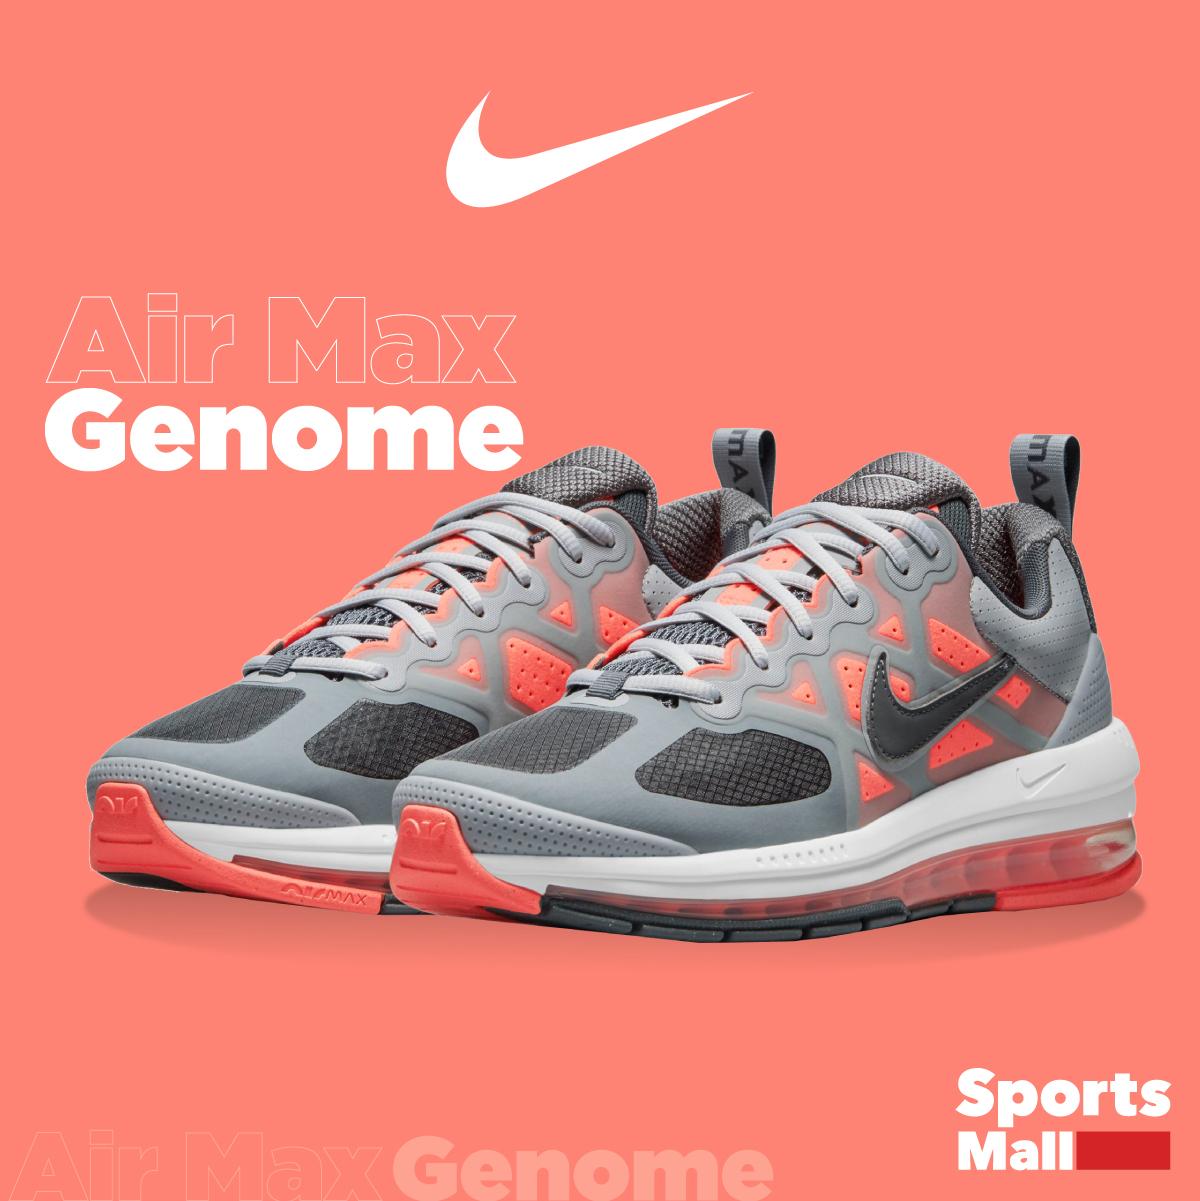 Air Max Genome